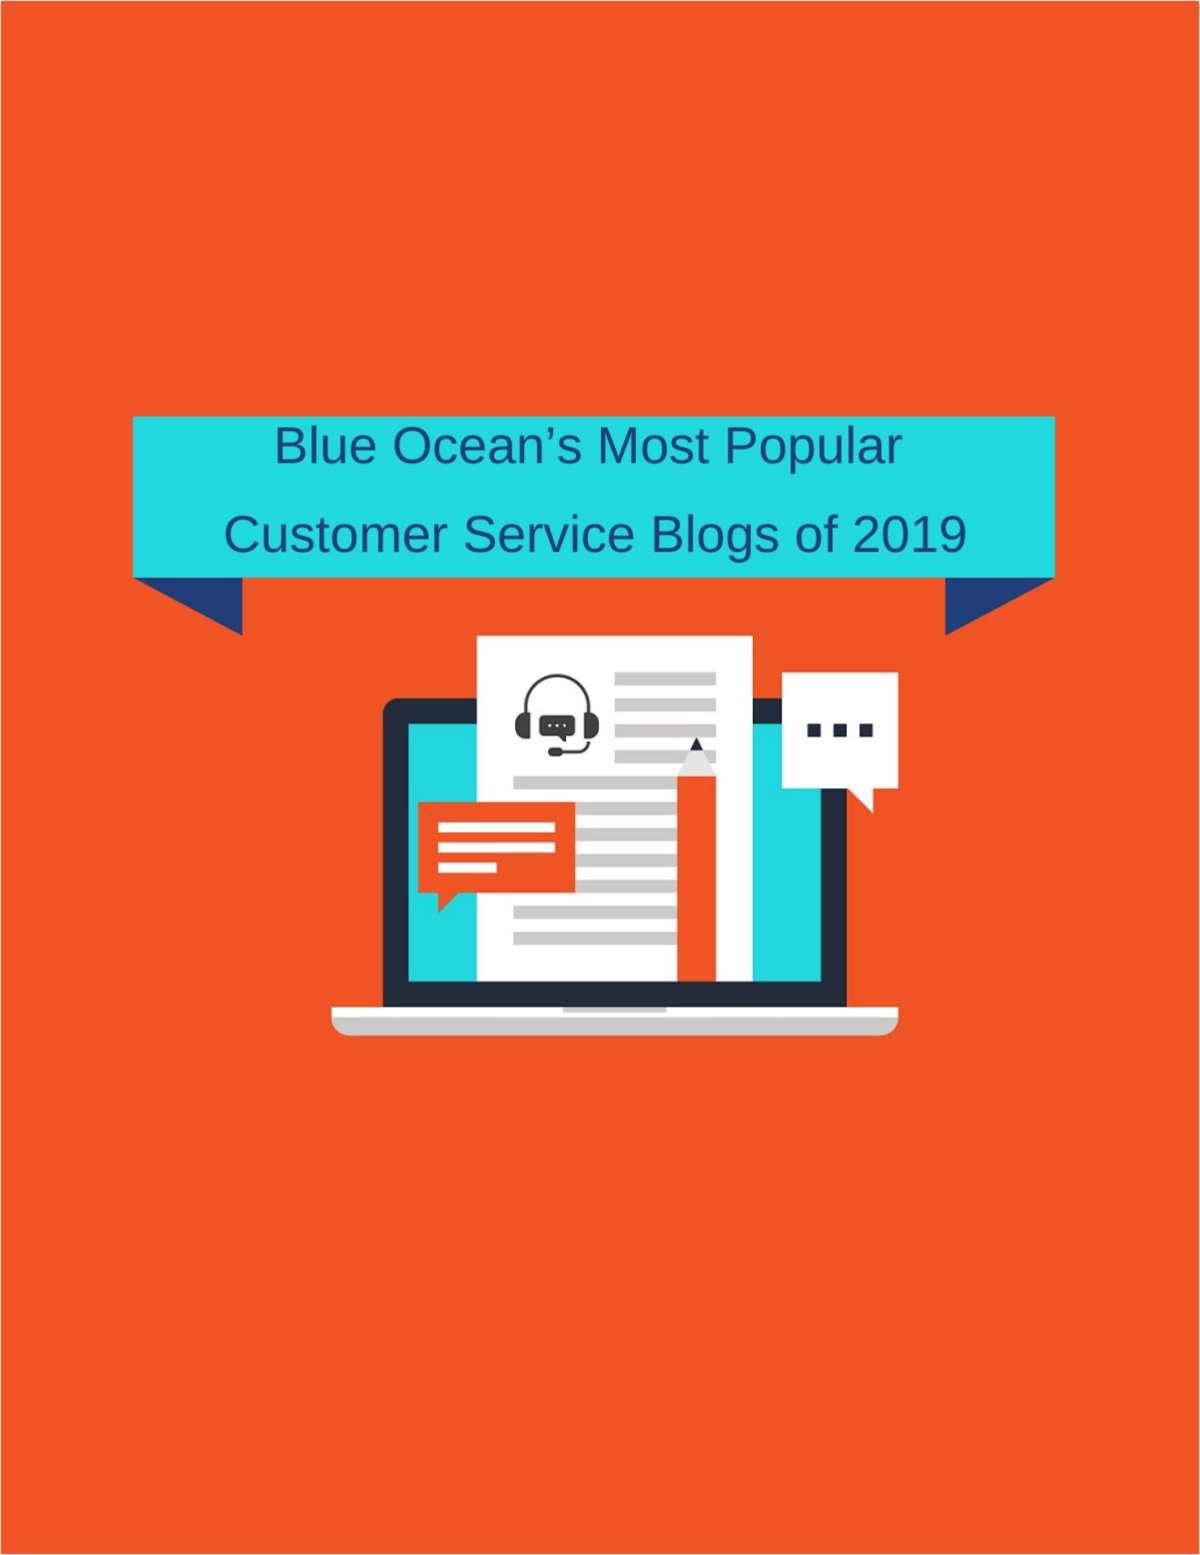 Blue Ocean's Most Popular Customer Service Blogs of 2019